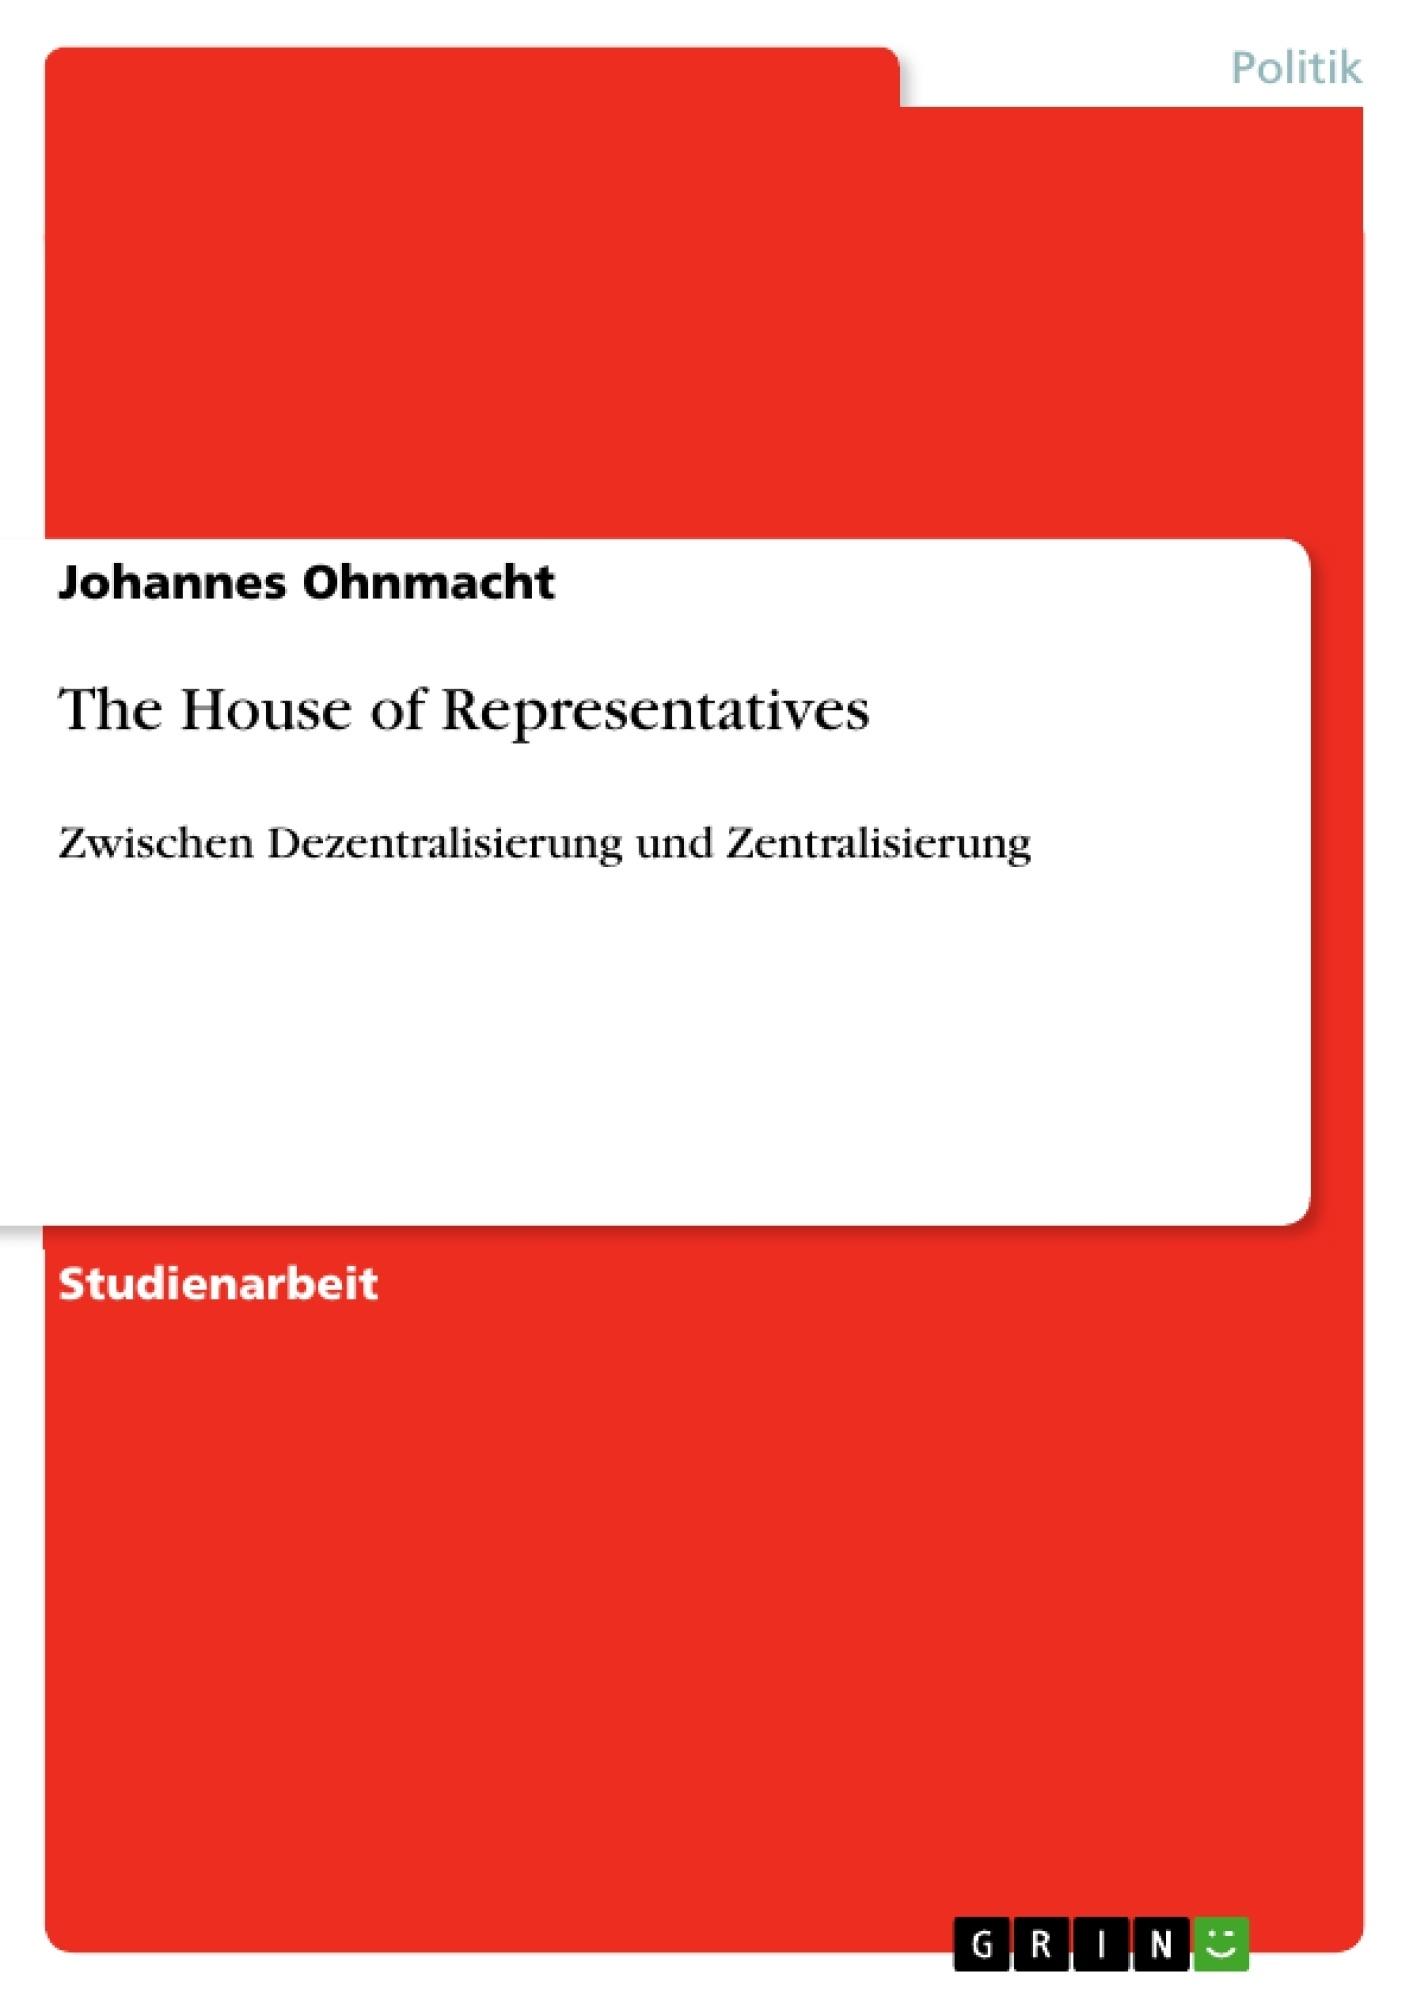 Titel: The House of Representatives